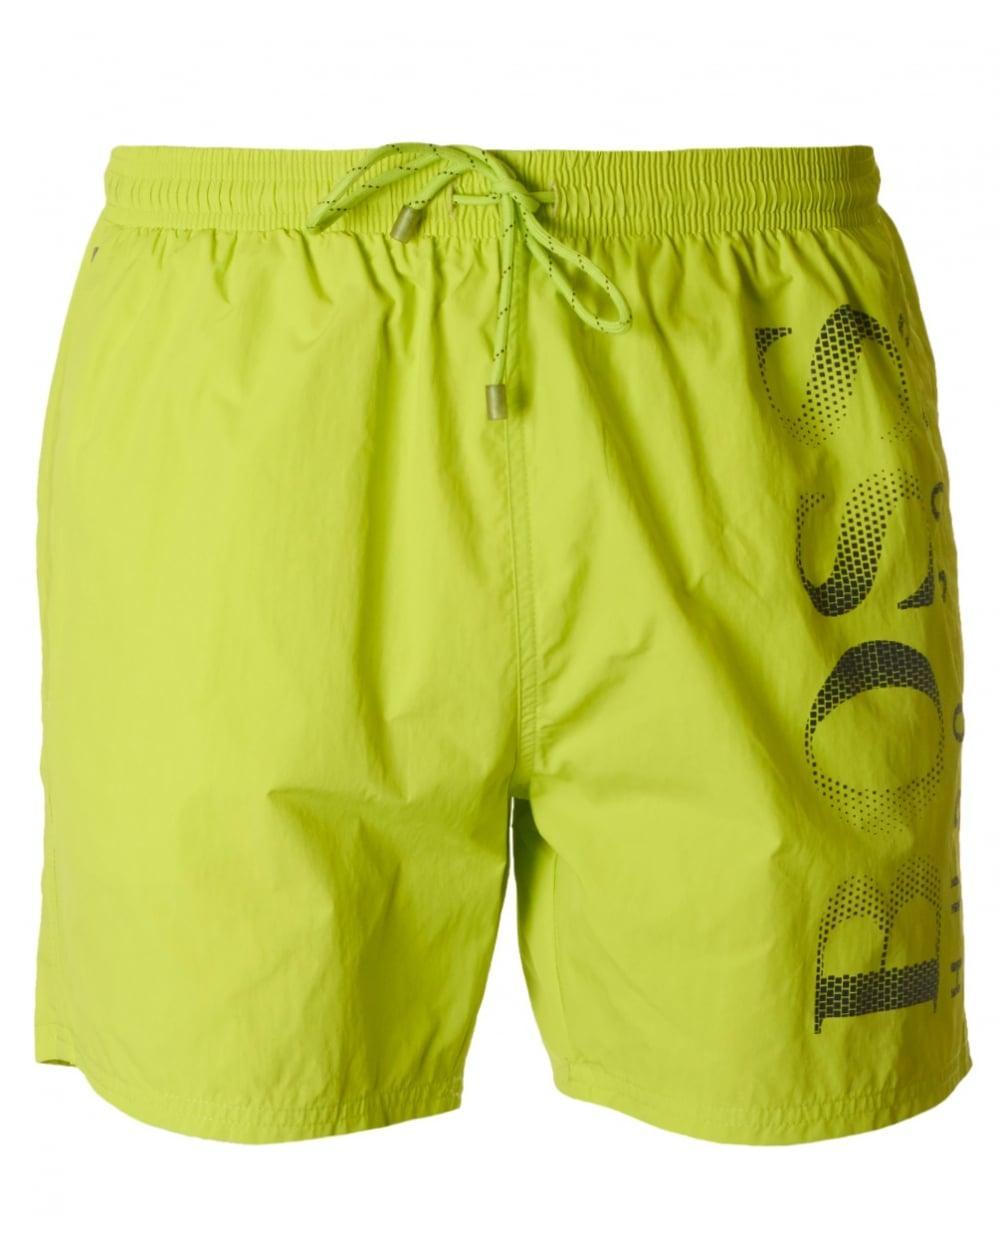 1ed006fb6e BOSS by Hugo Boss Octopus Swim Shorts in Yellow for Men - Lyst